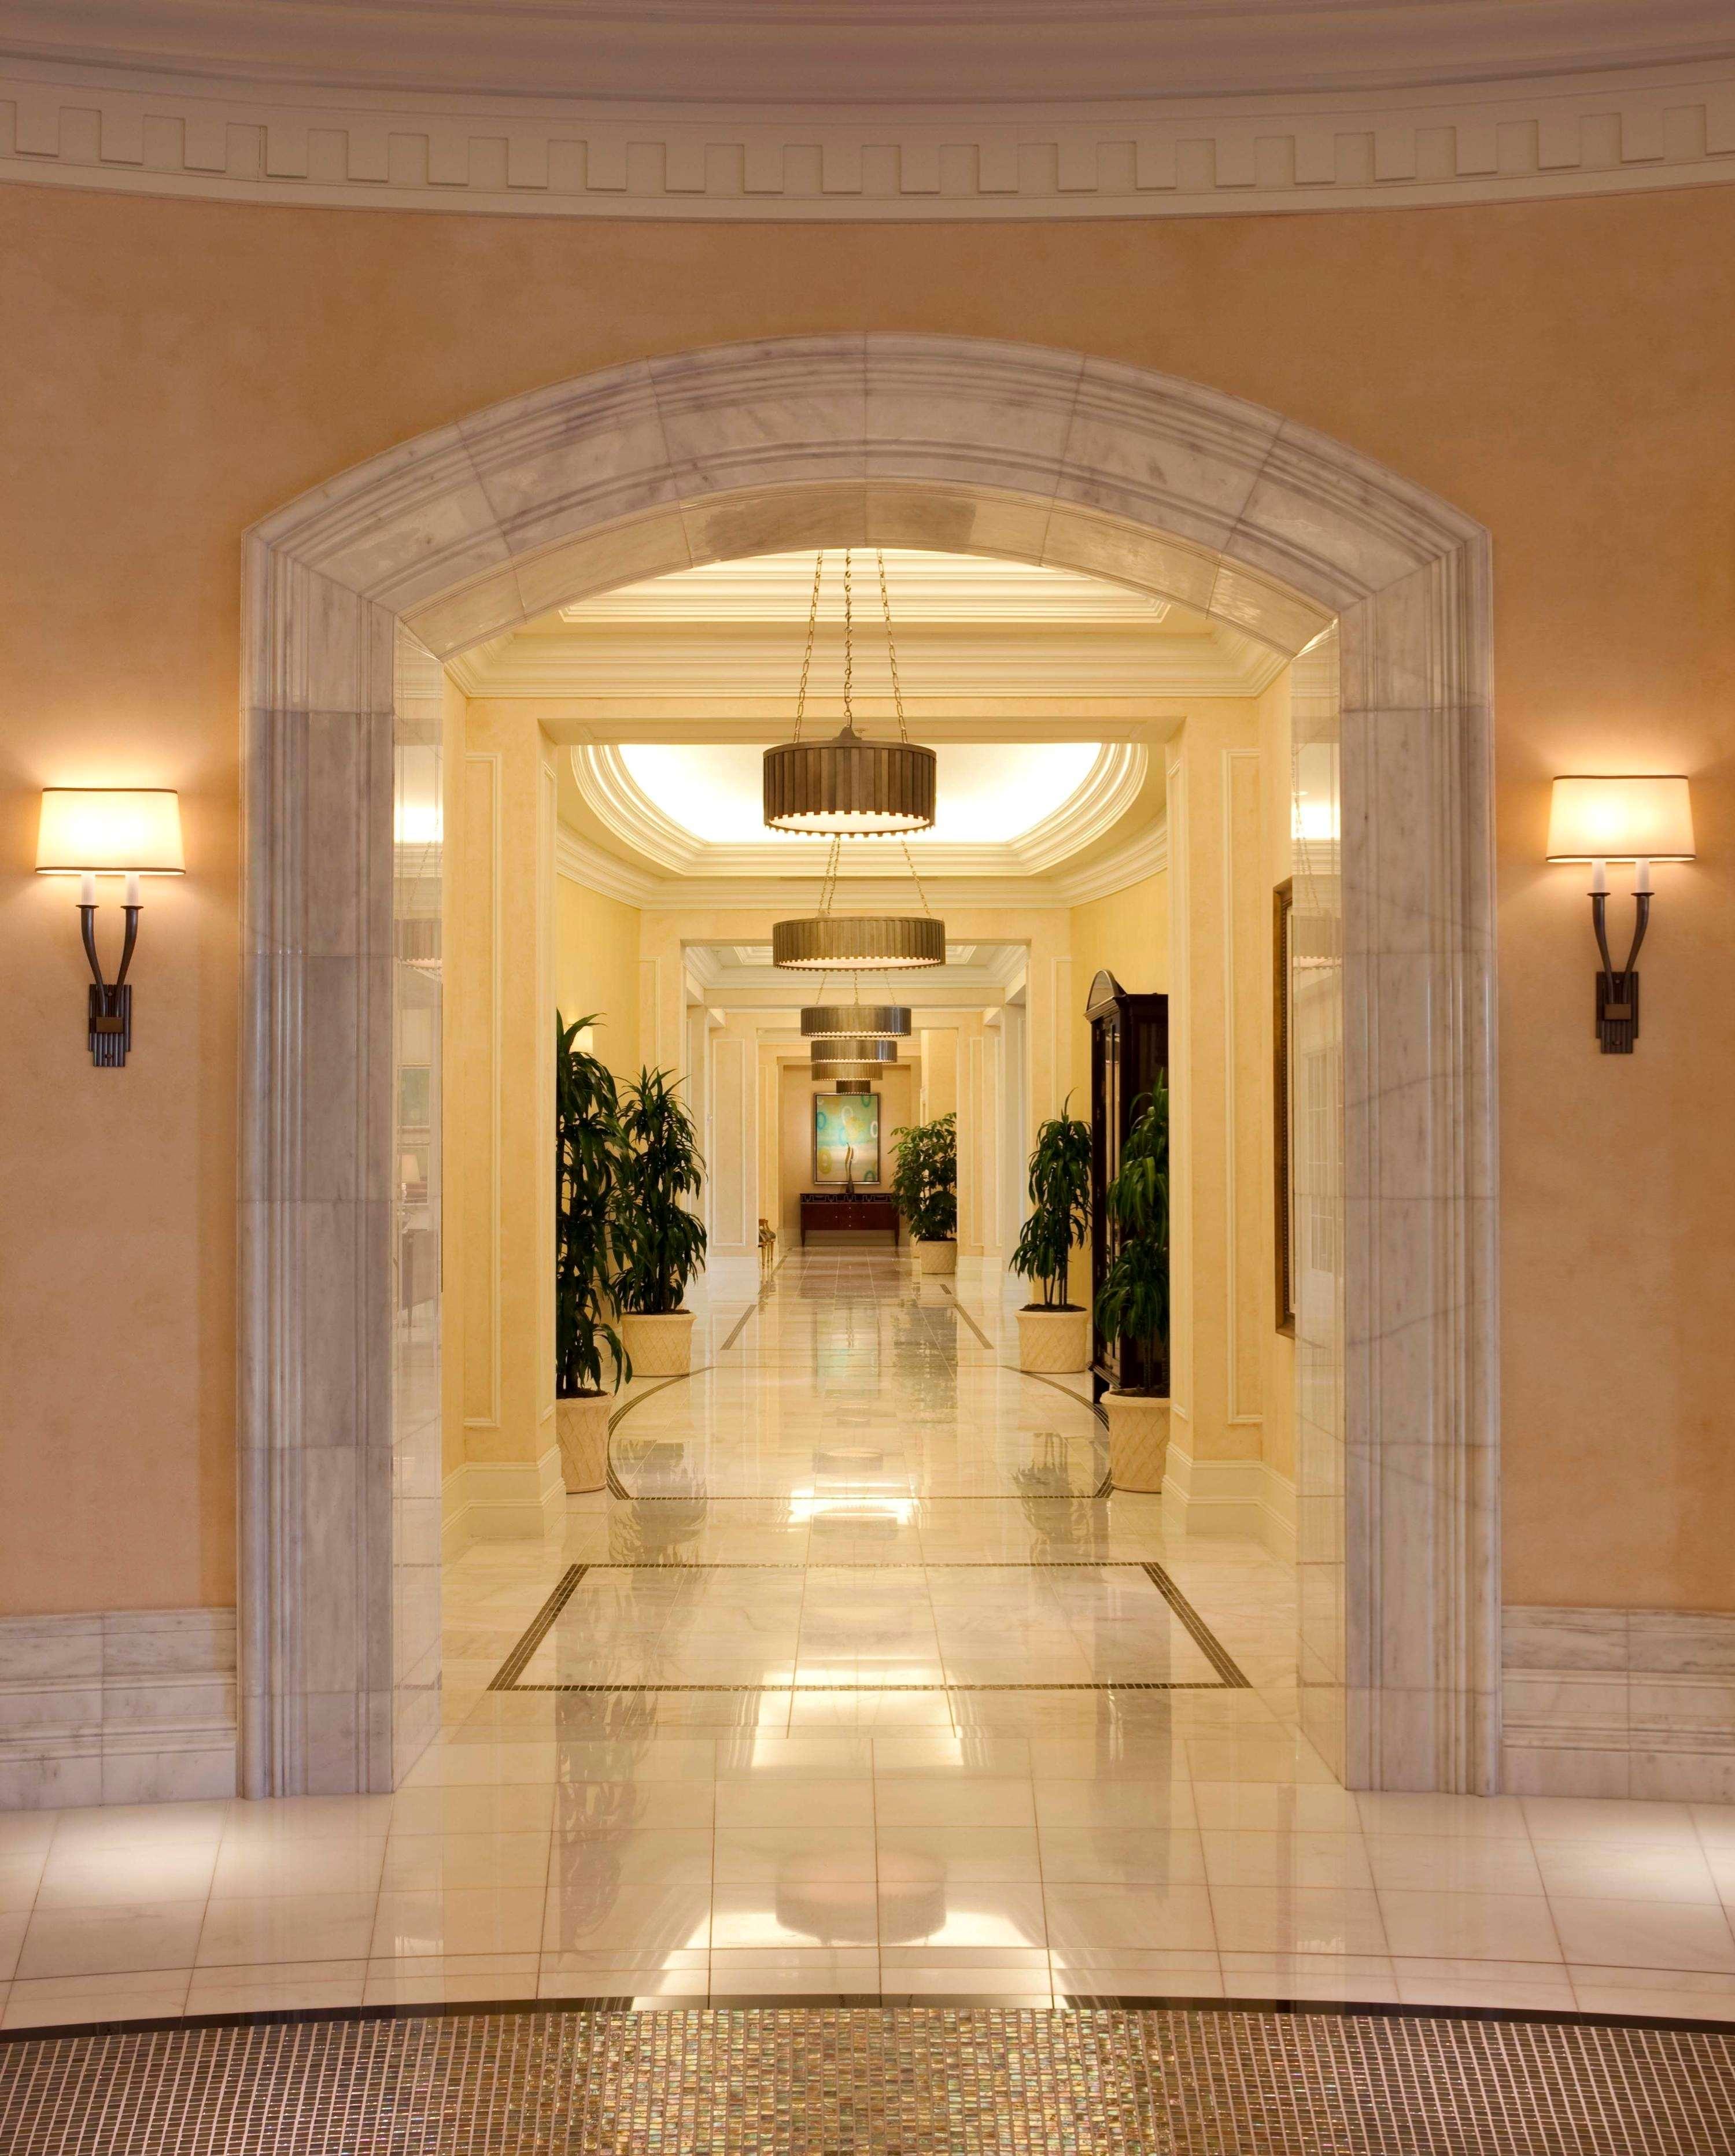 Waldorf Astoria Orlando Coupons Near Me In Orlando 8coupons